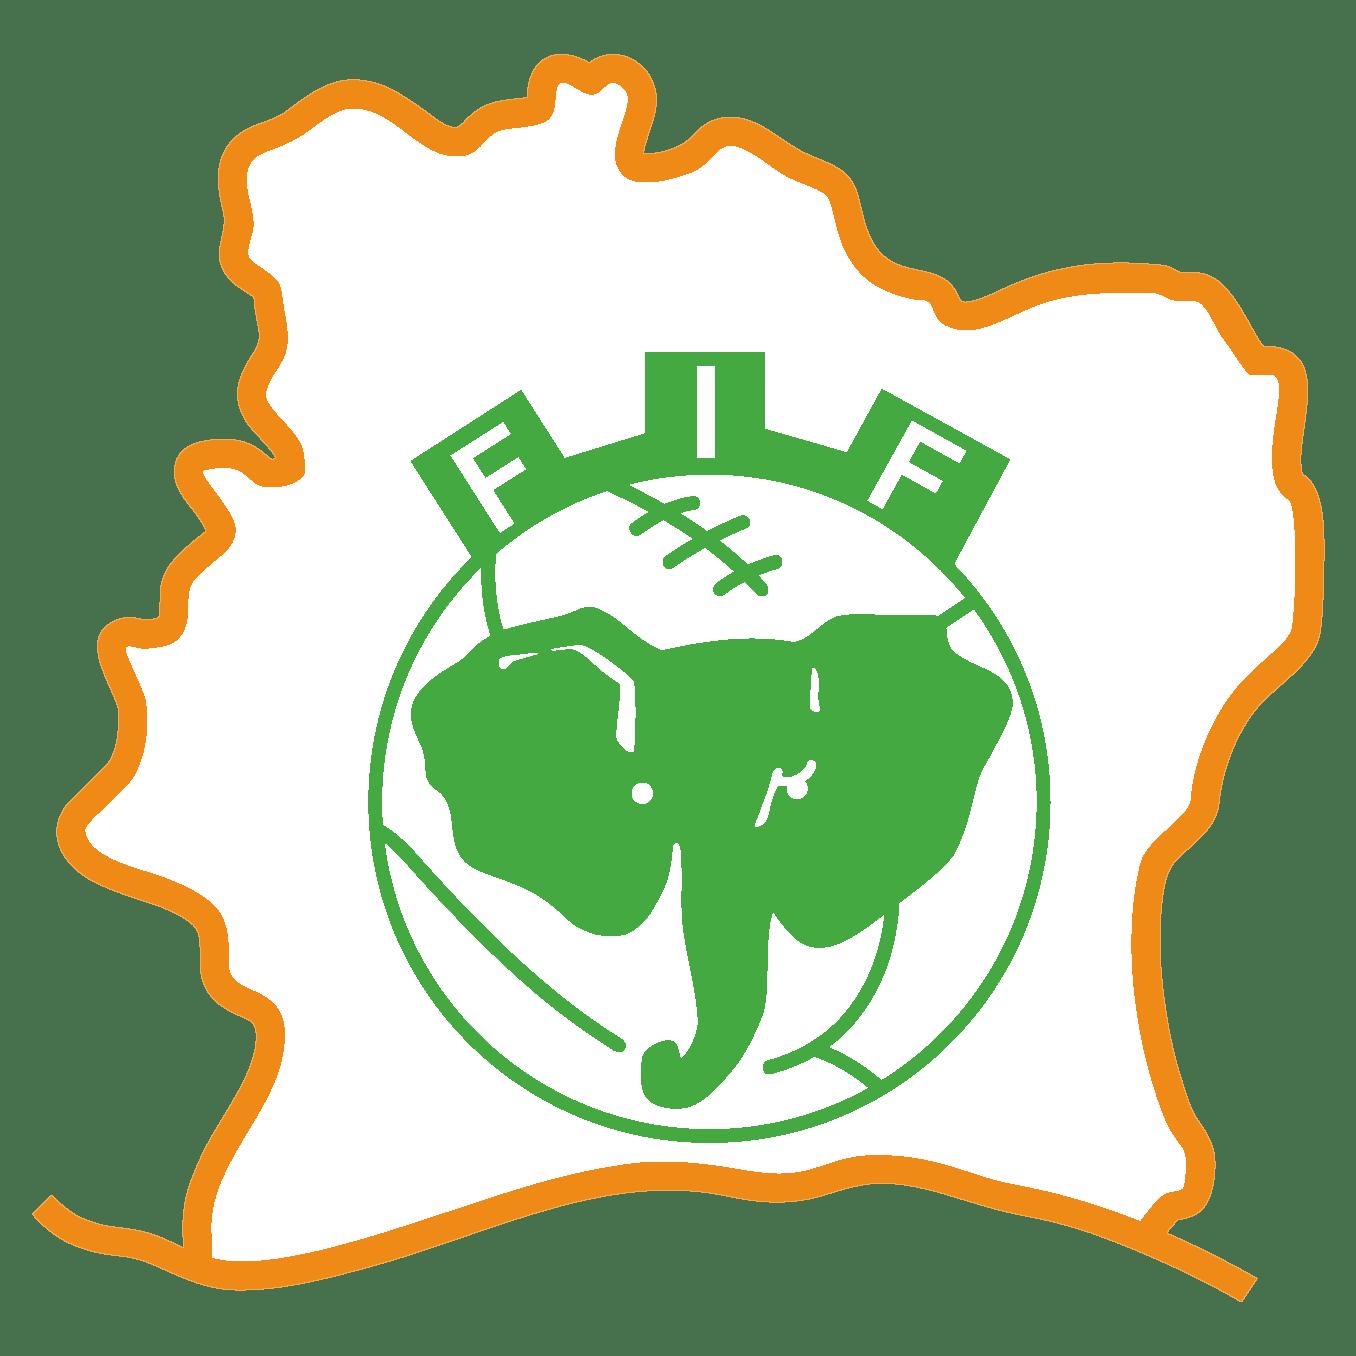 Federation Ivoirienne de Football & Cute dIvoire National Team Logo png